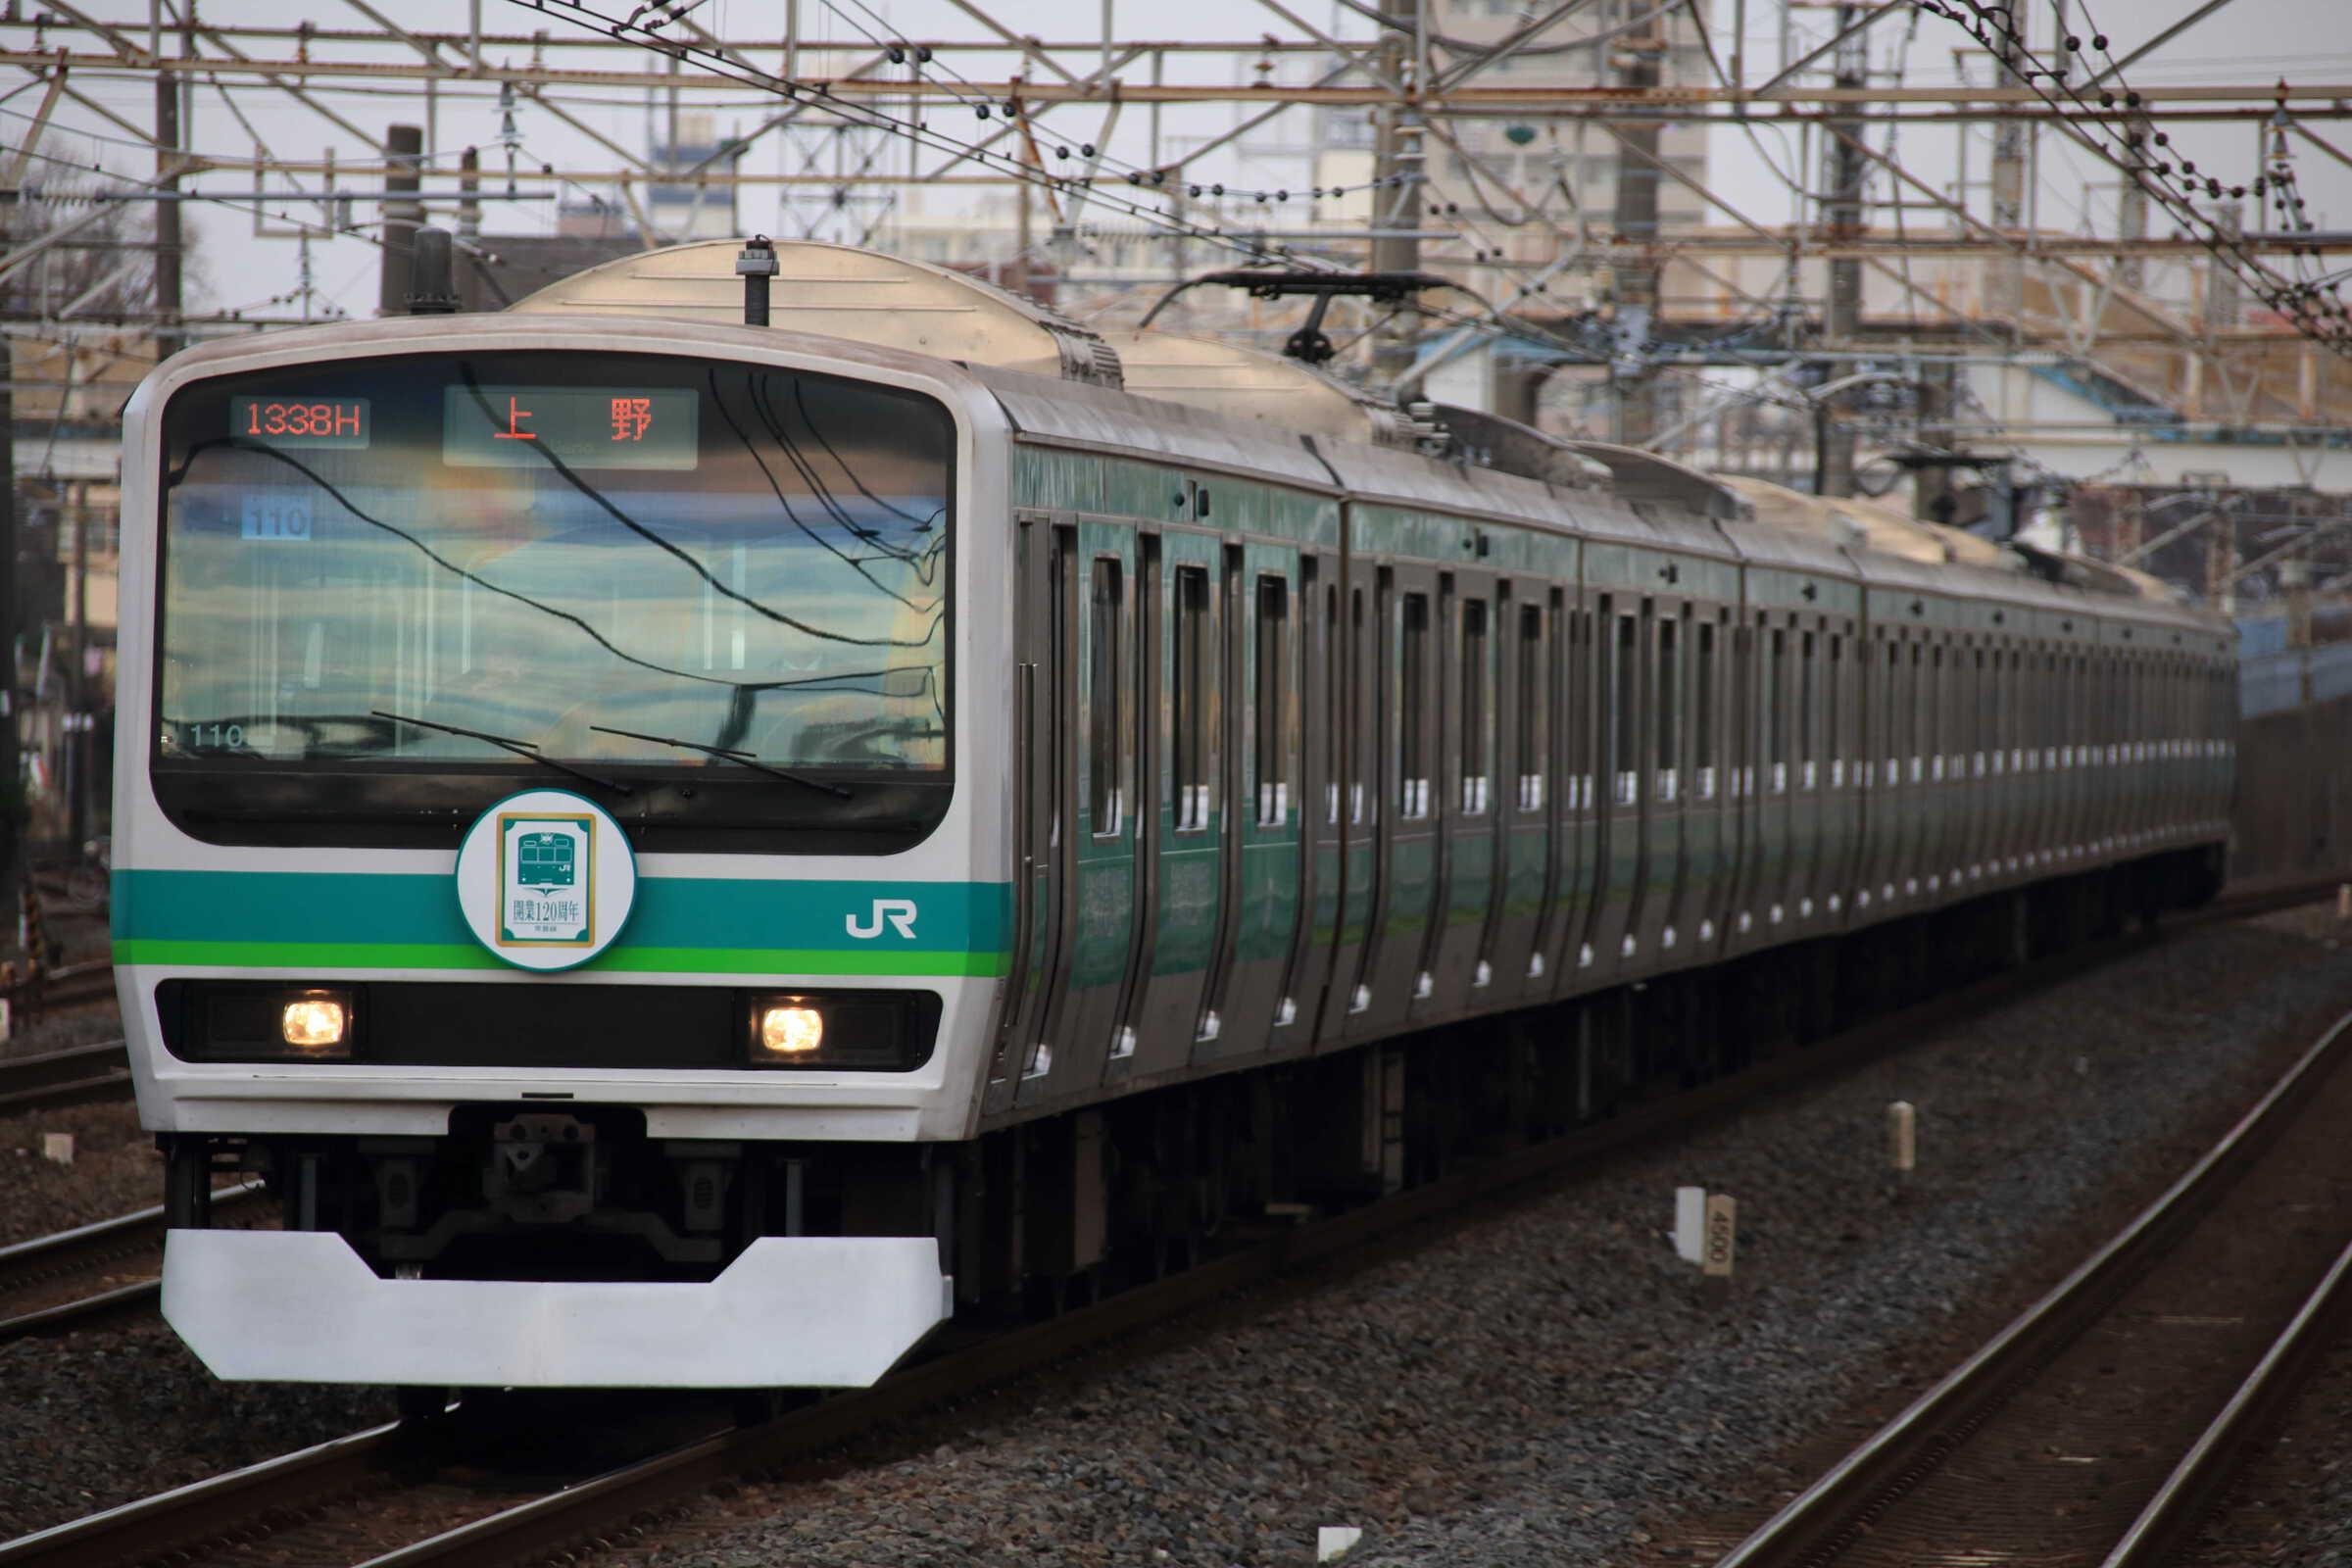 1338H E231系 東マト110編成(常磐線開業120周年ラッピング&ヘッドマーク付き)